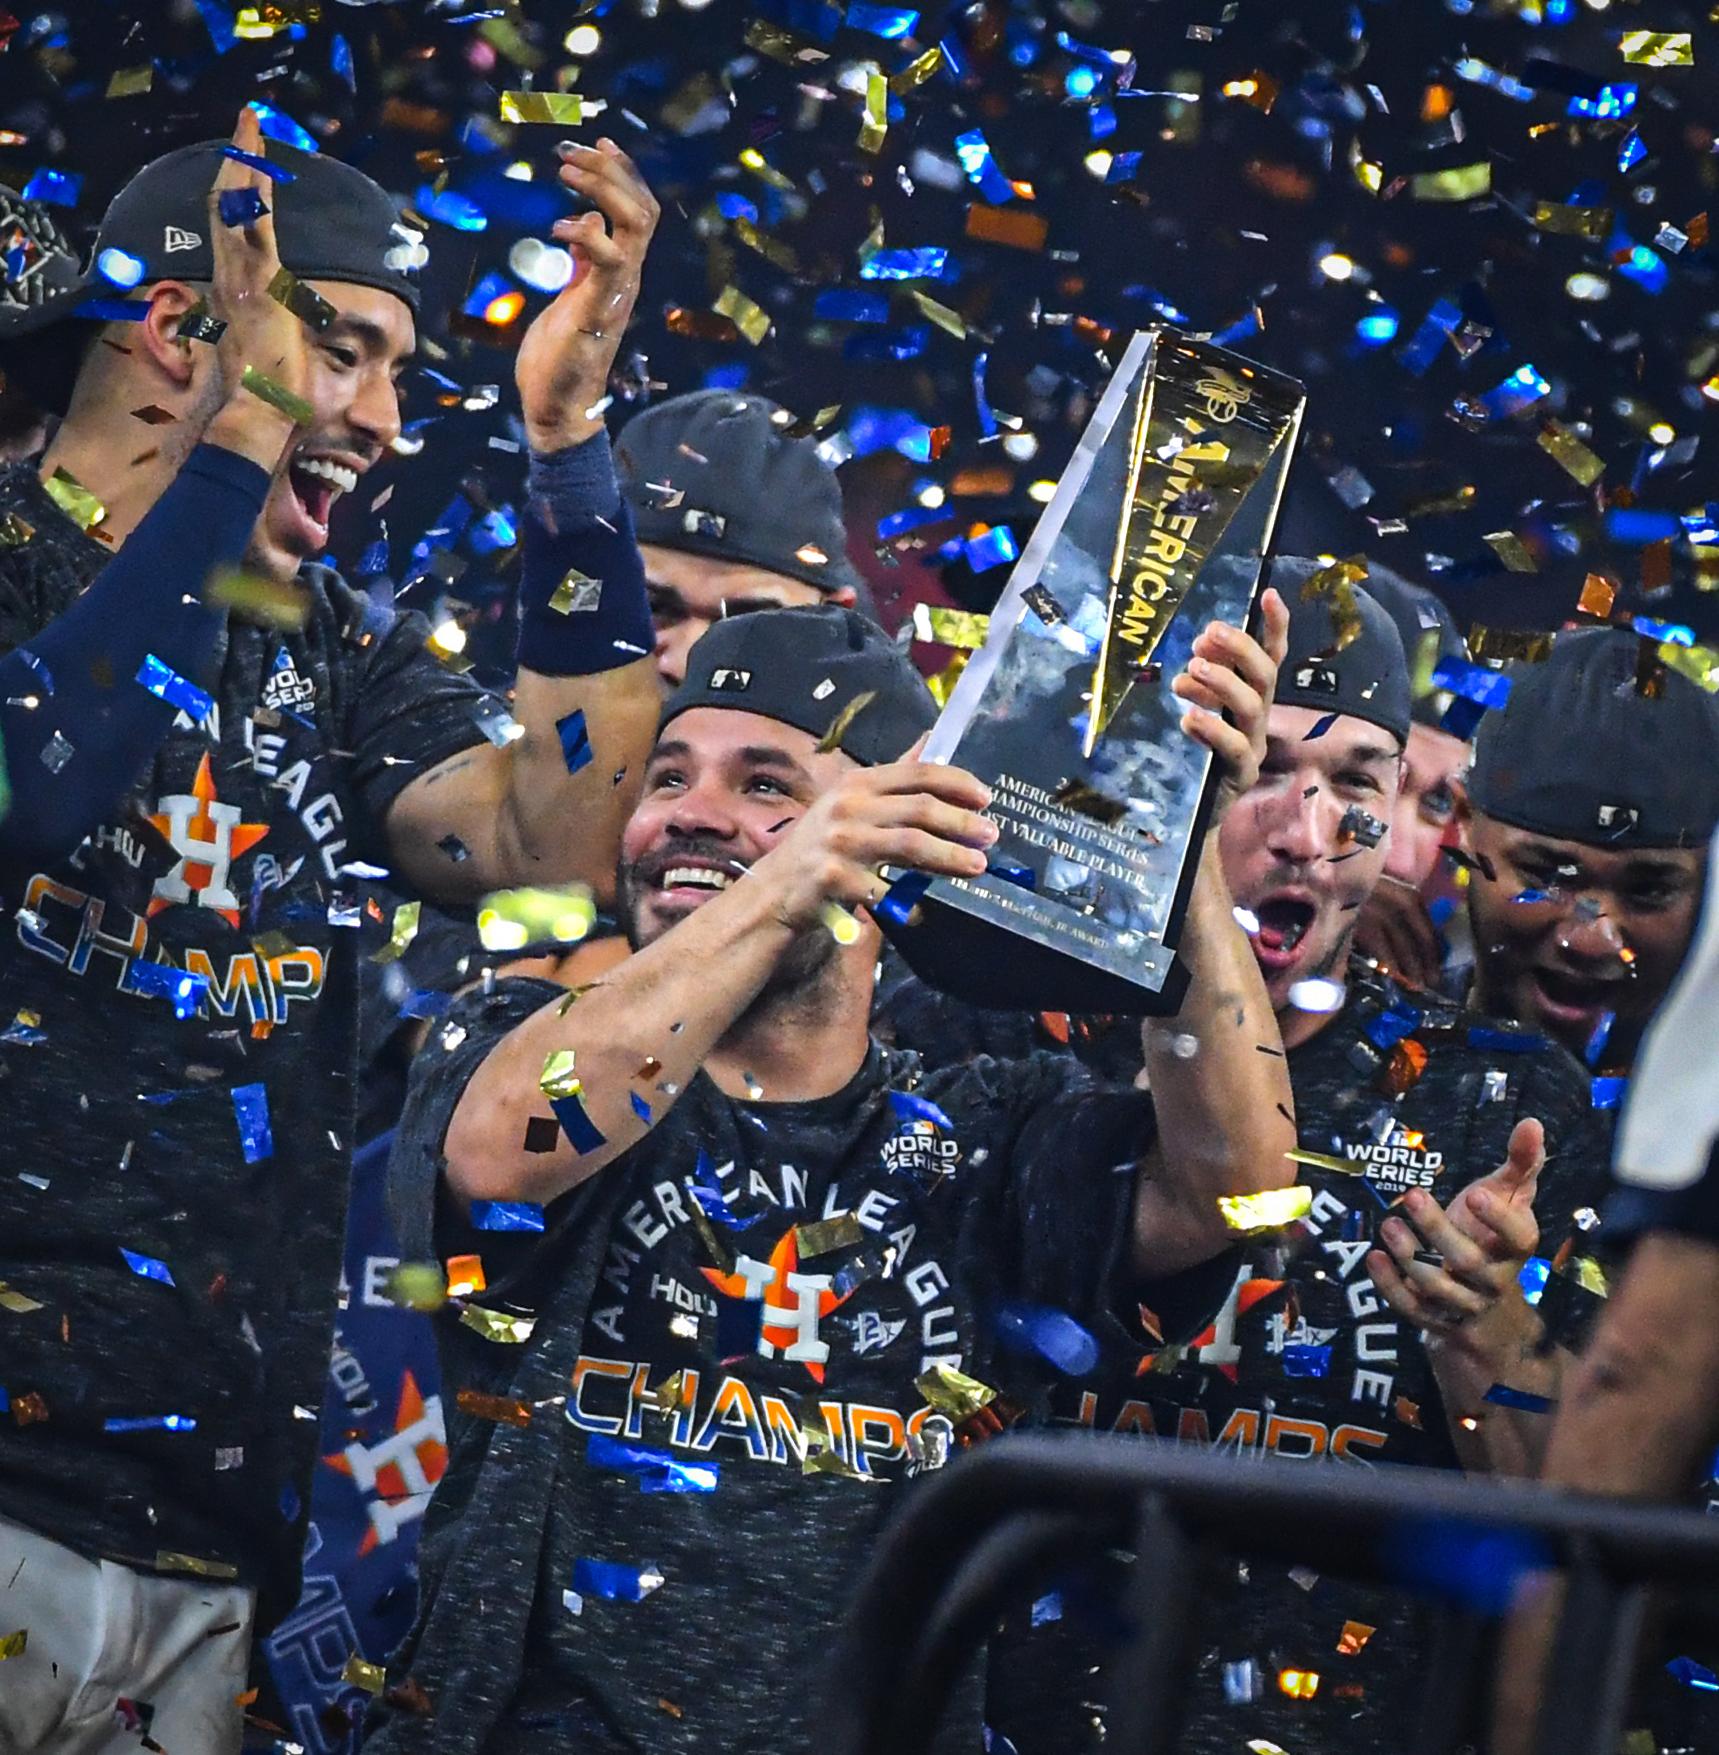 Houston Astros player Jose Altuve wins MVP trophy in 2019